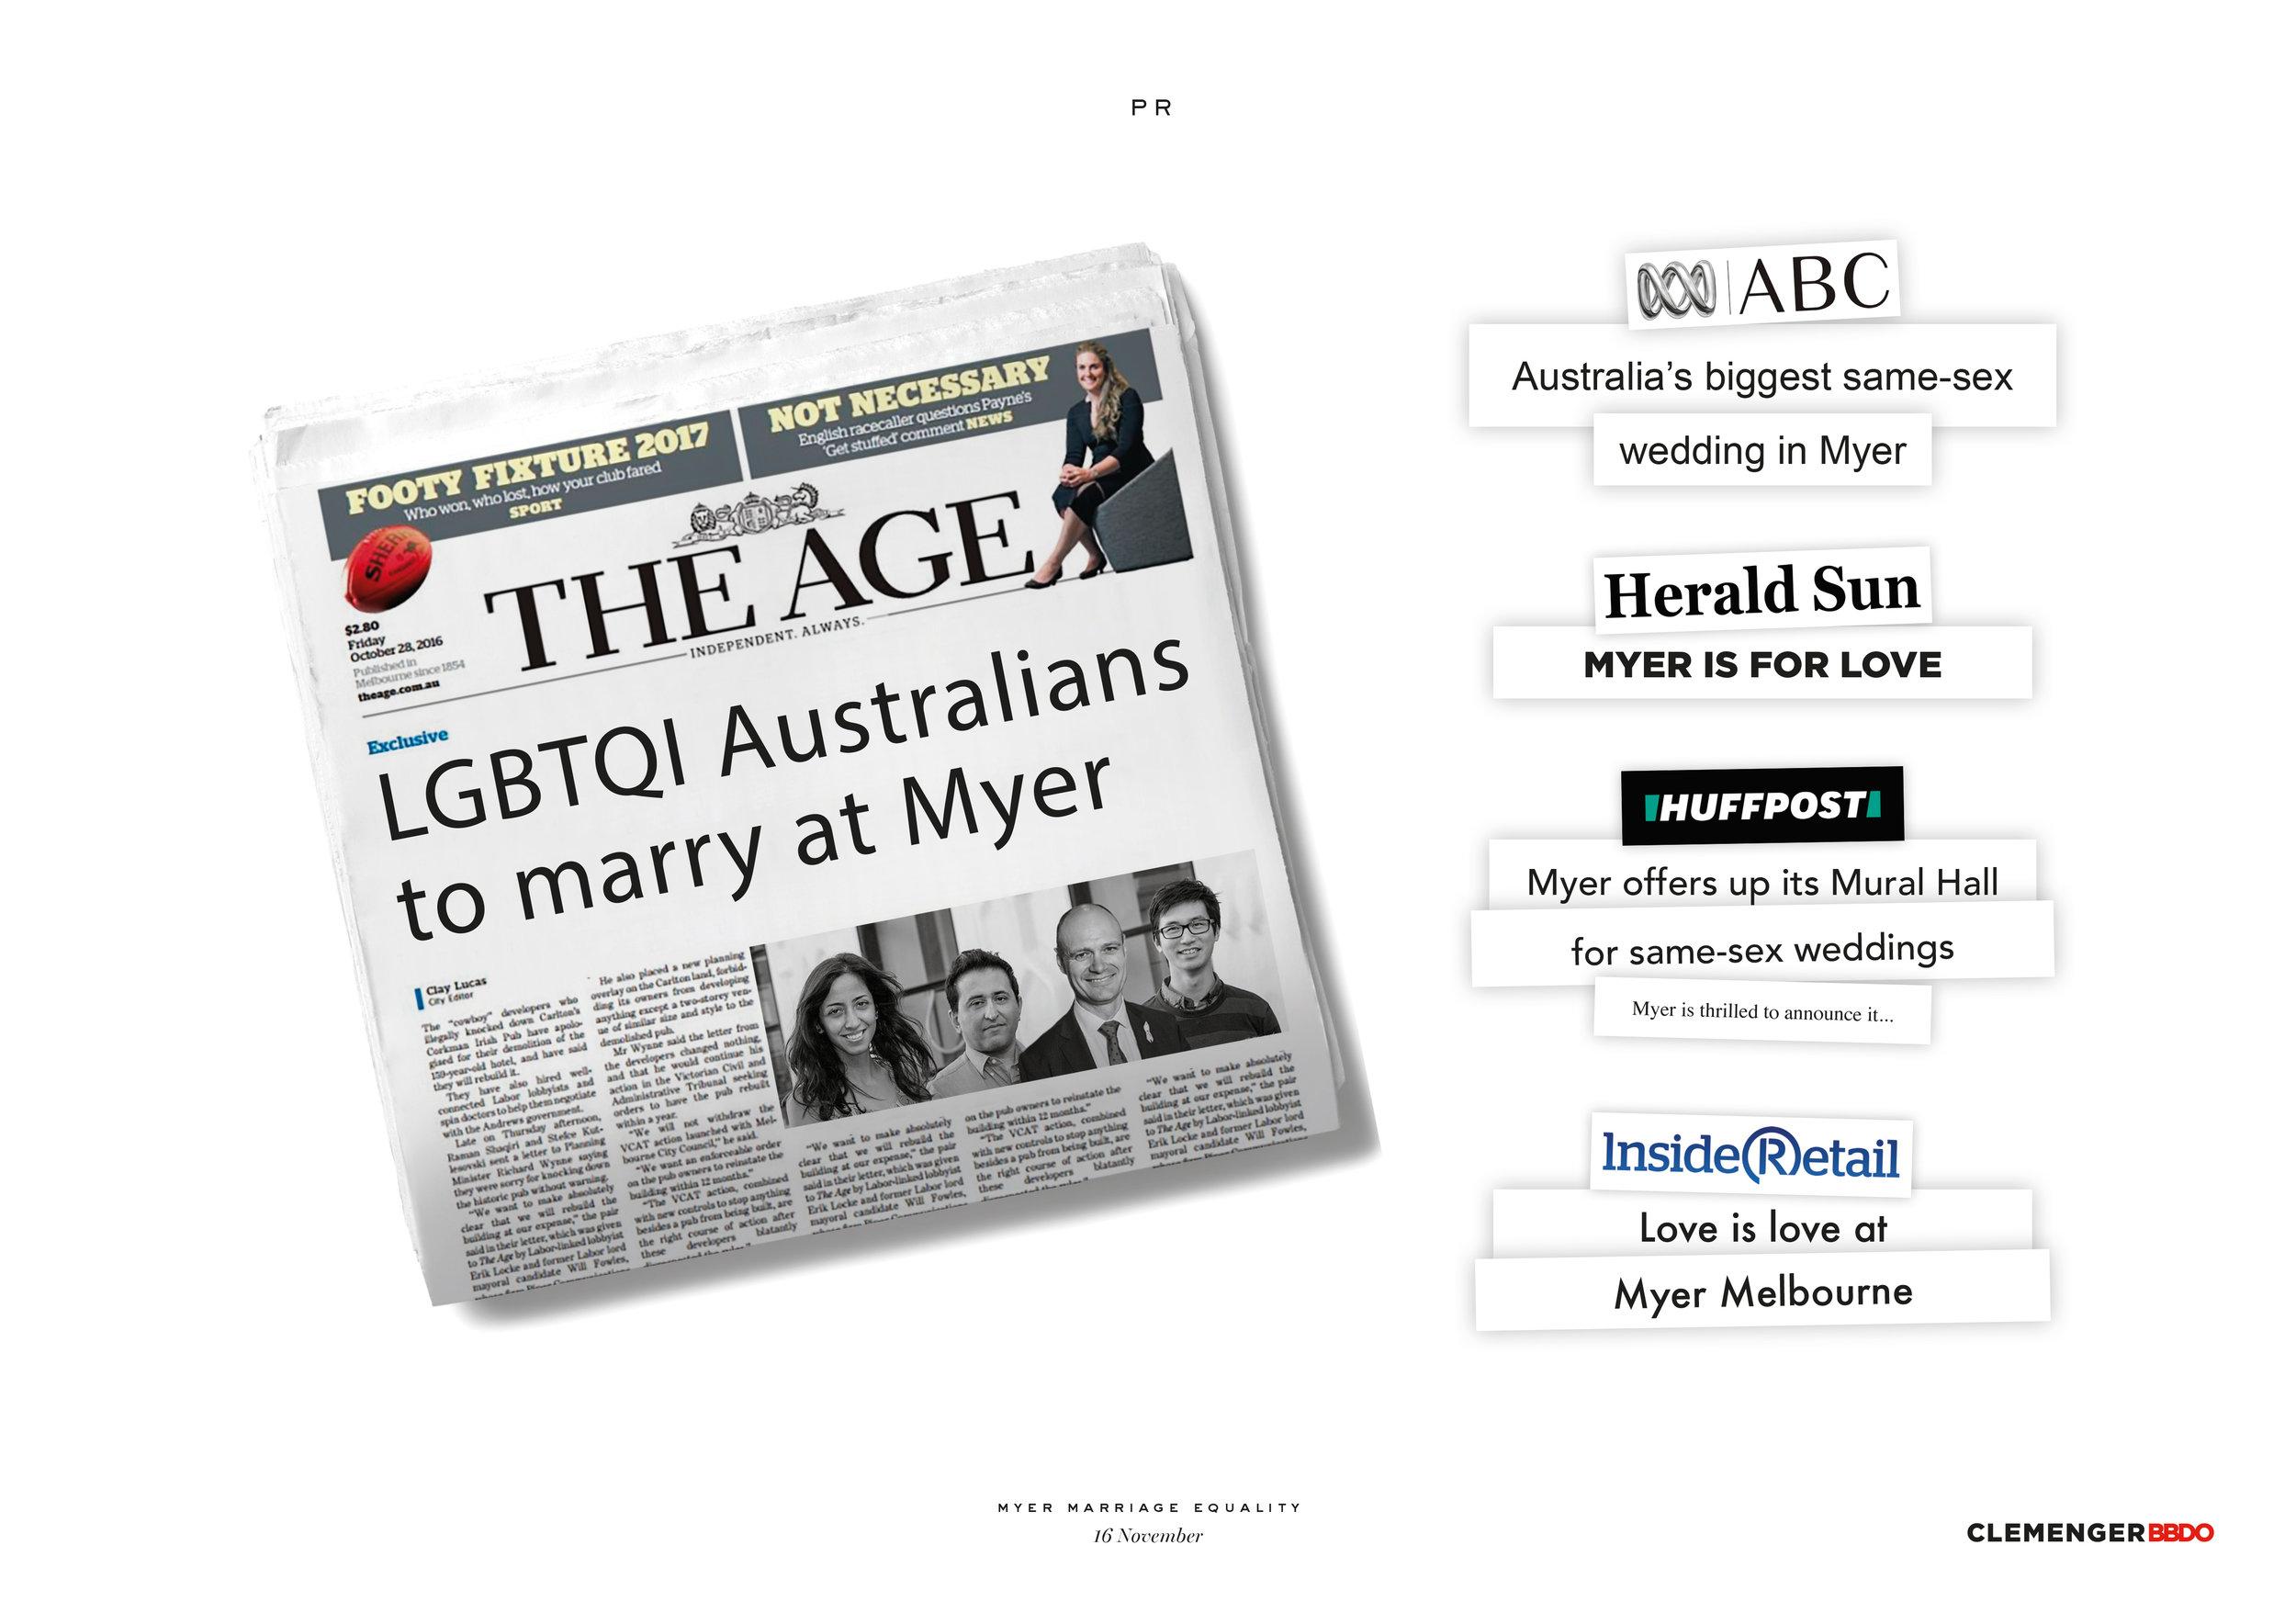 MYER3027_Marriage-Equality-Presentation-V05-5.jpg